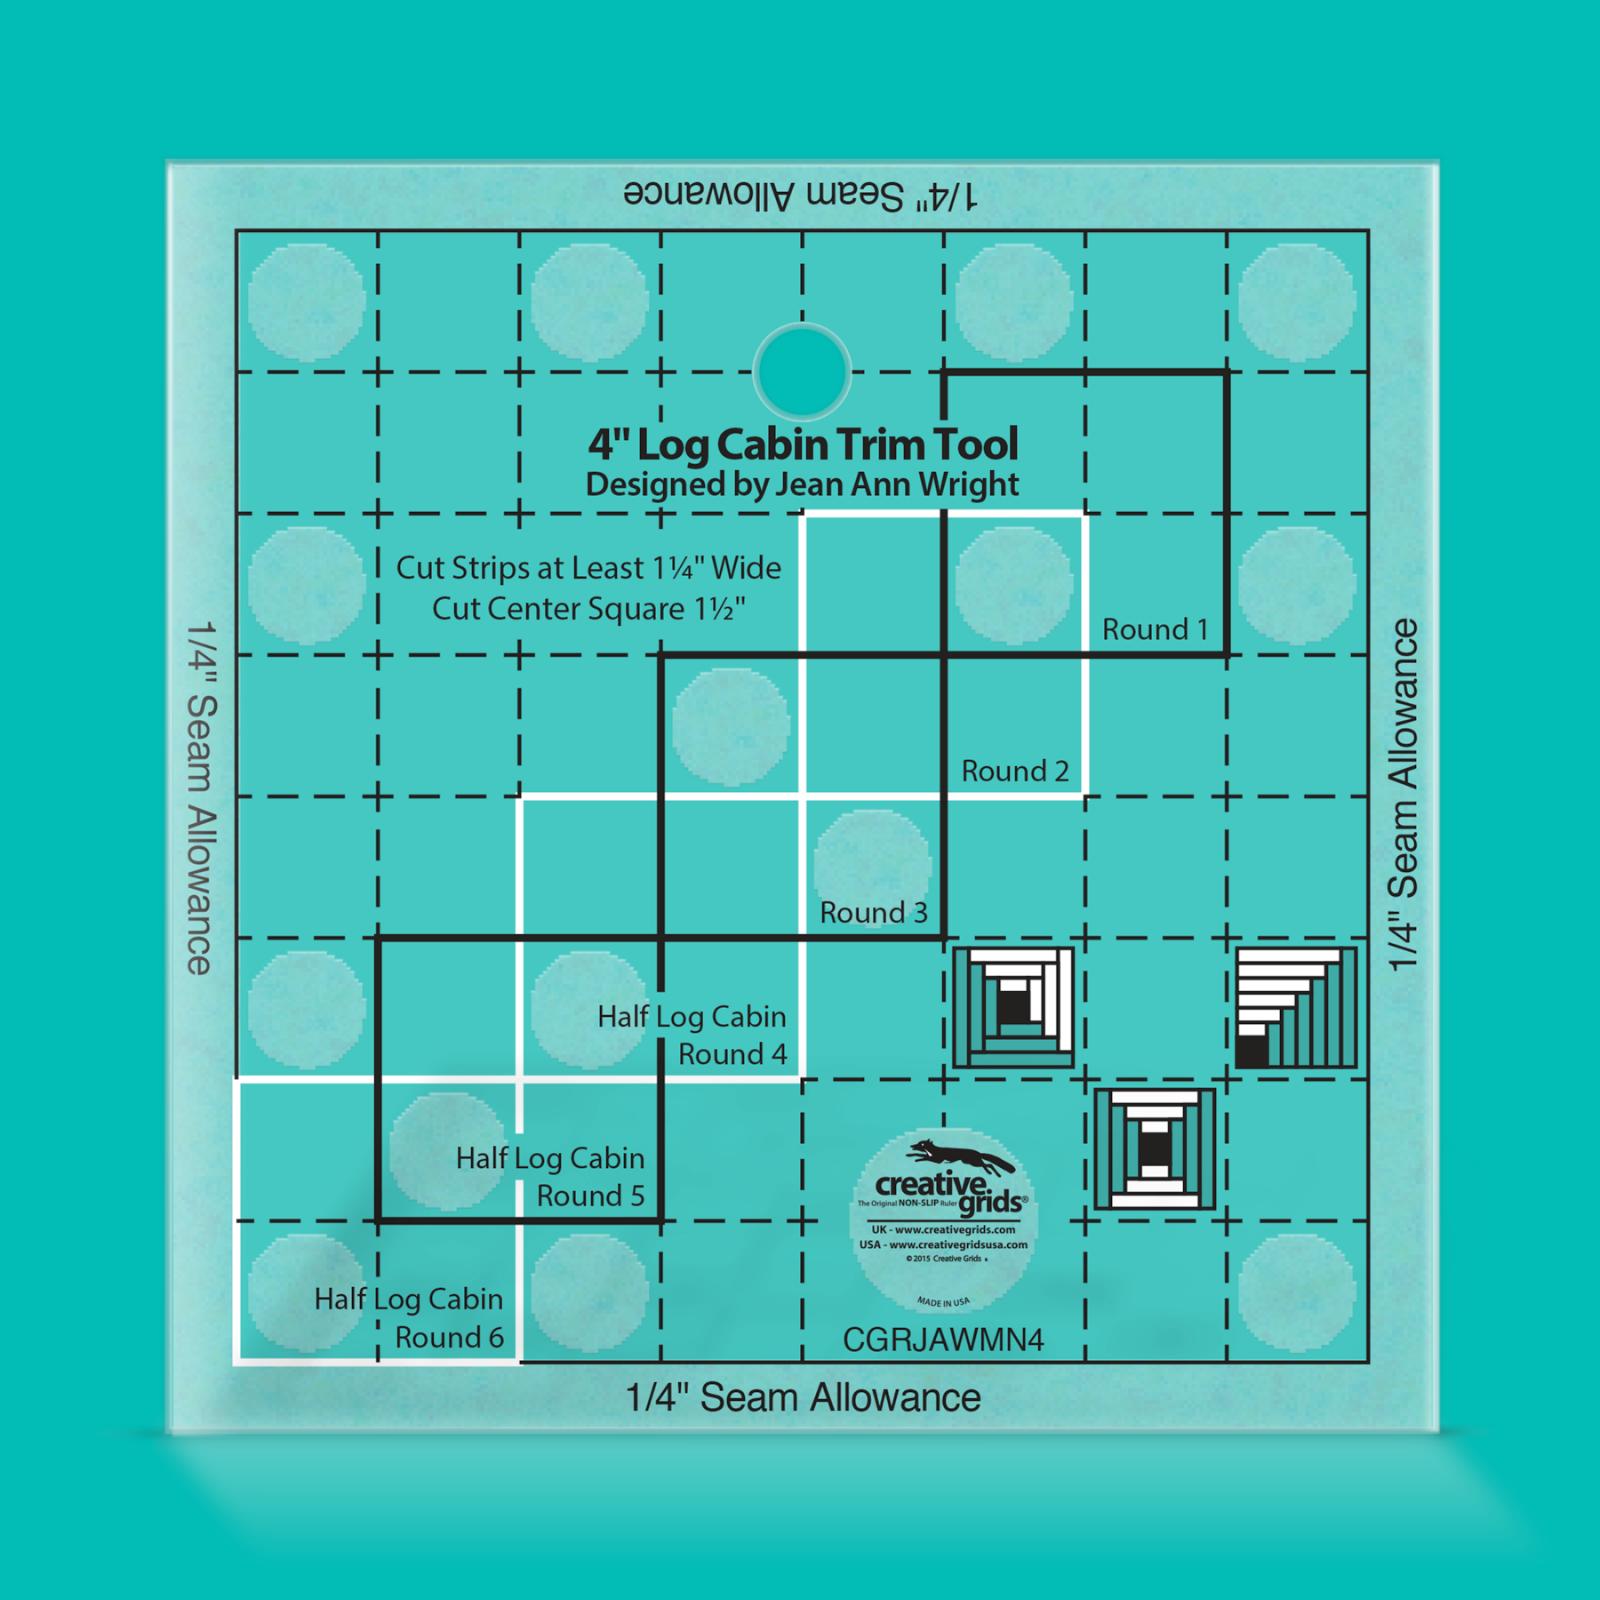 Creative Grids 4 Log Cabin Trim Tool | SKU# CGRJAWMN4